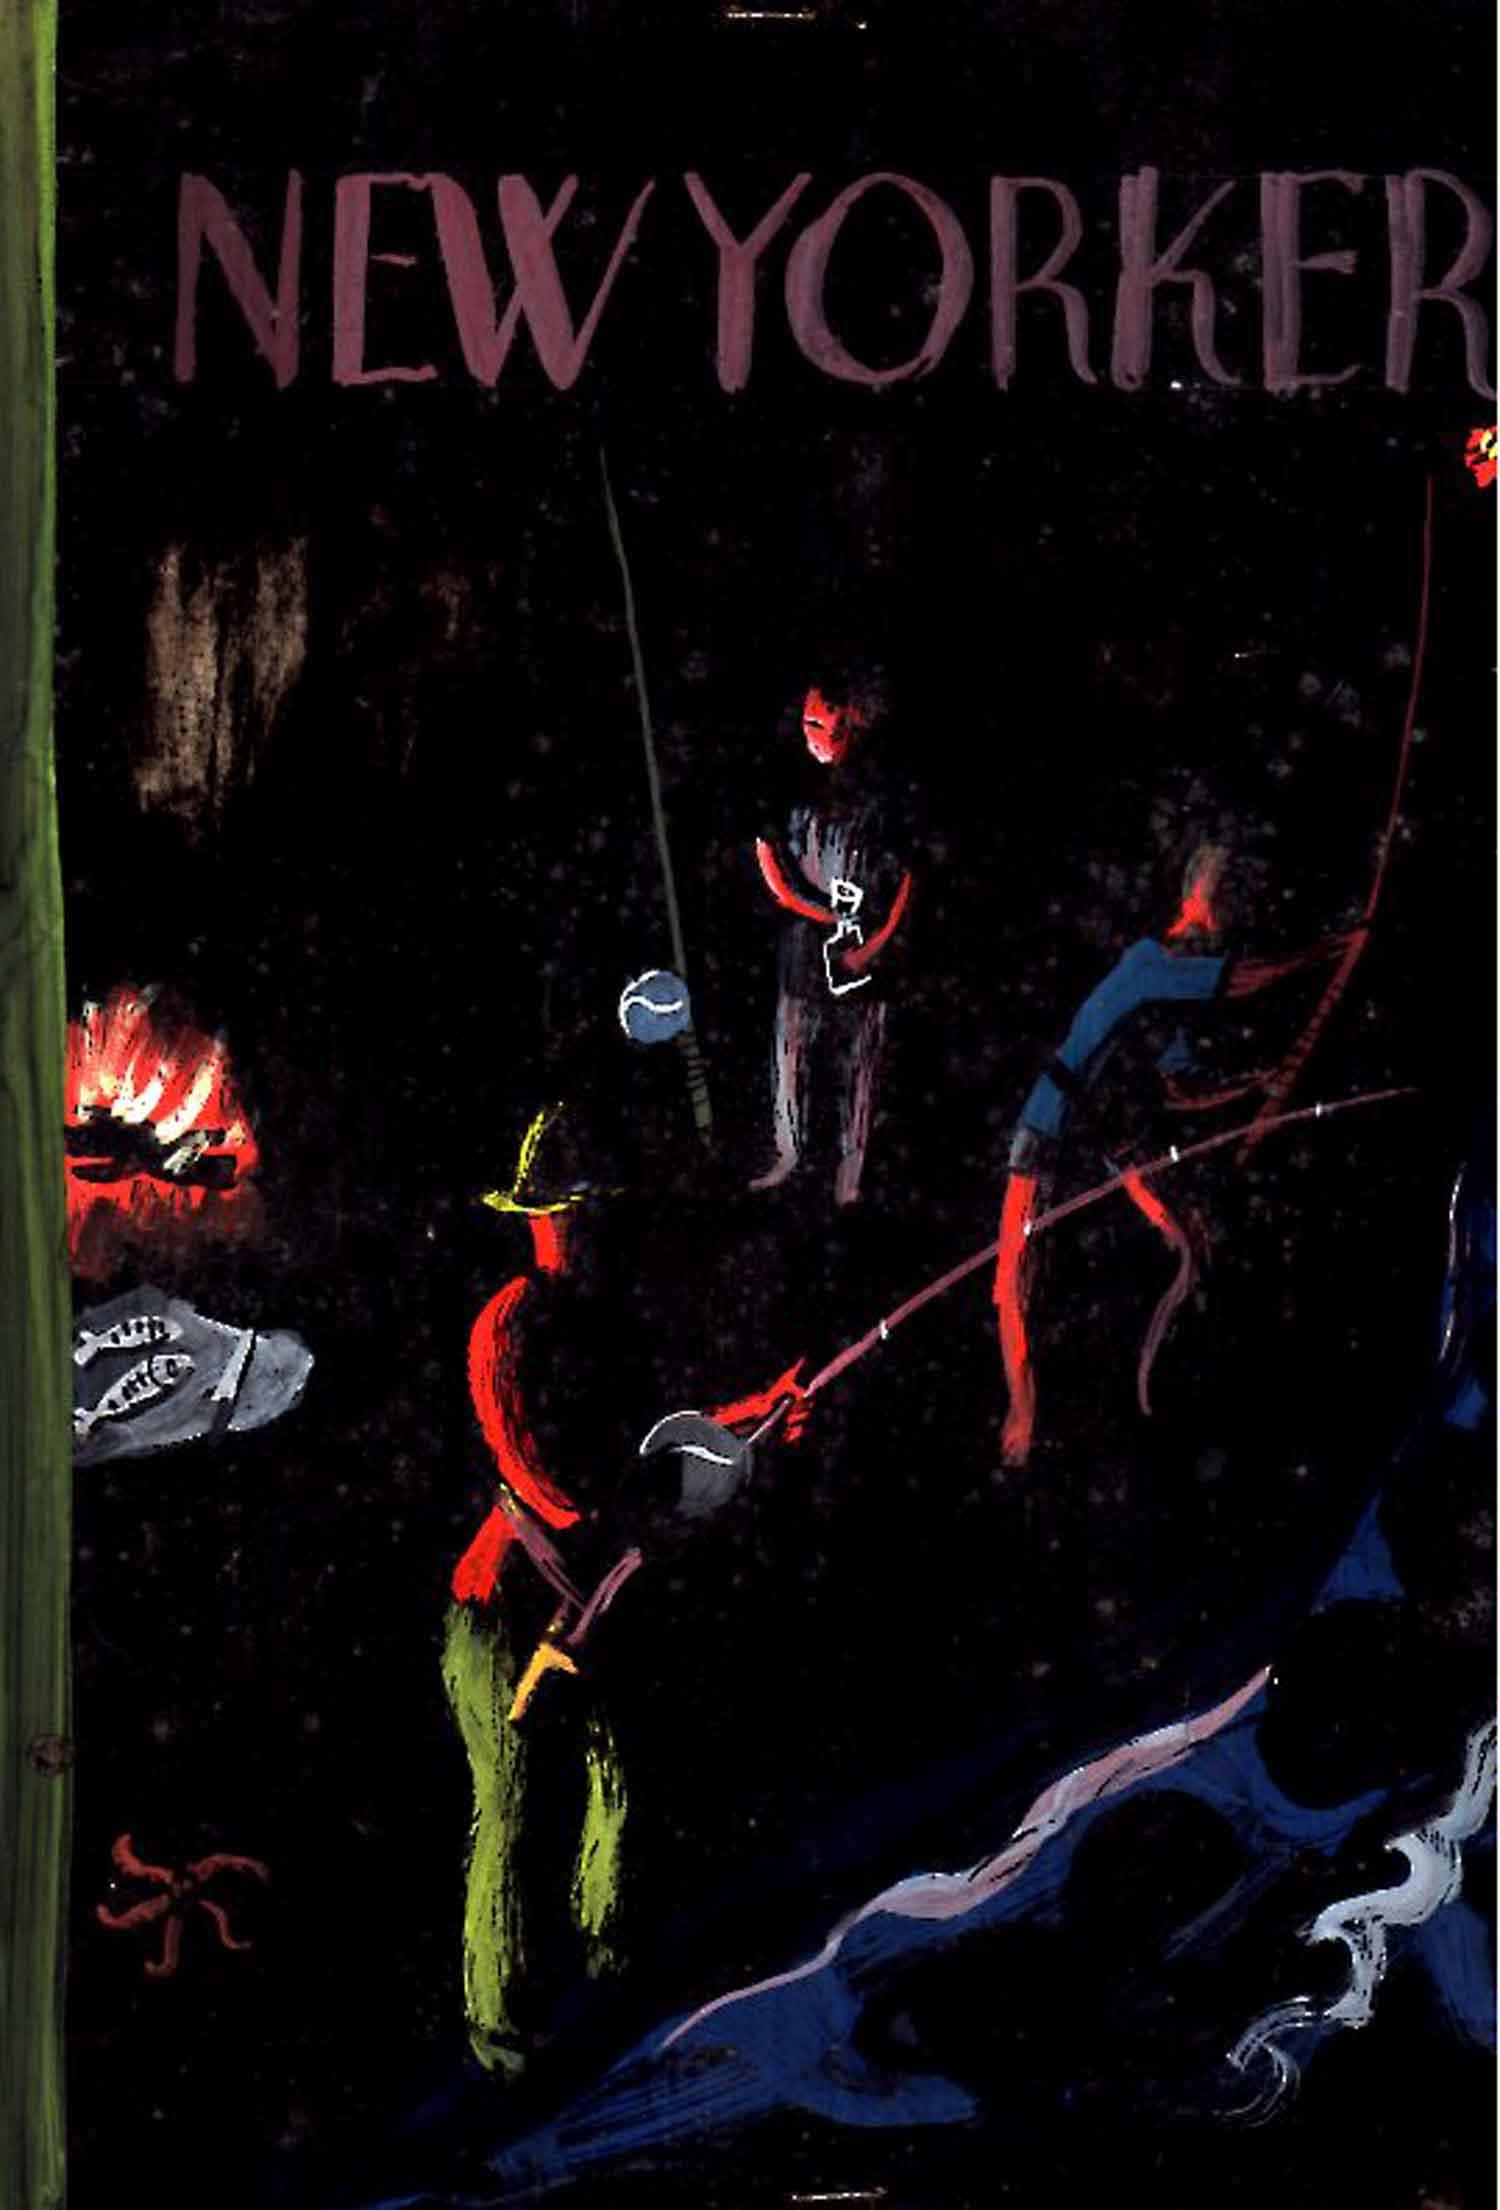 The New Yorker | Roger Duvoisin | Pêche à la ligne